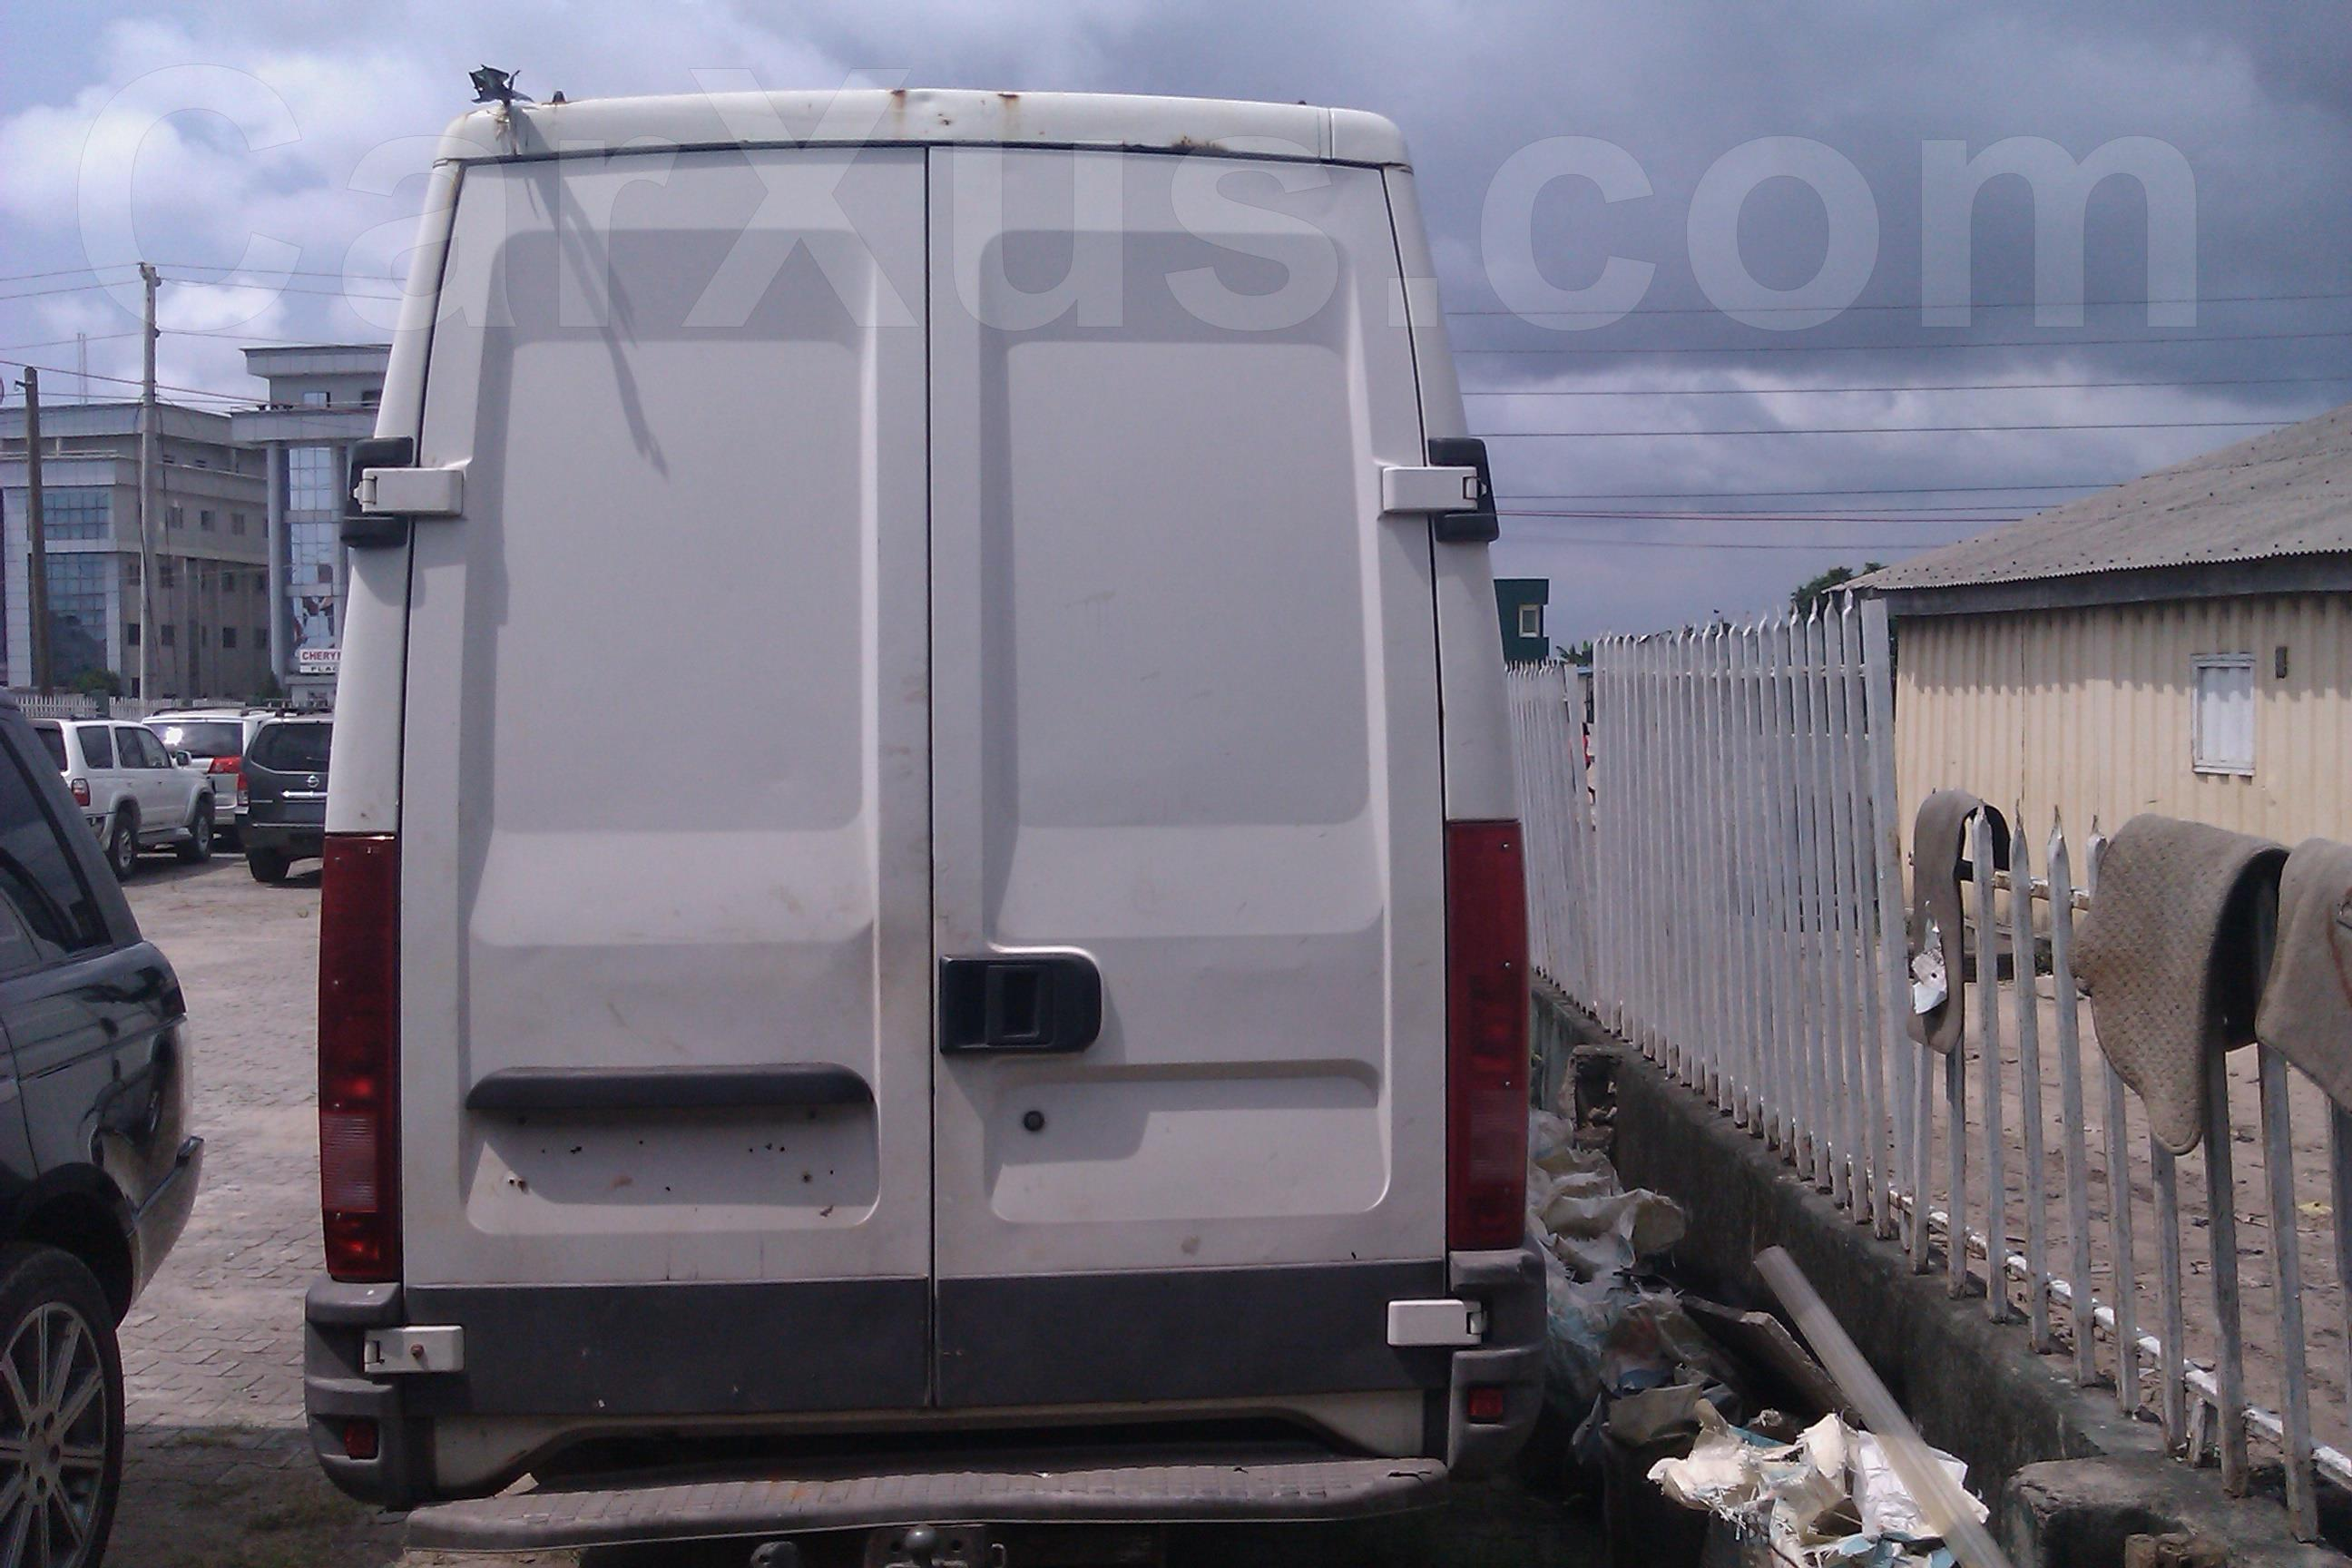 2000 Iveco Massif Buy Used Auto Car Online In Lagos Nigeria